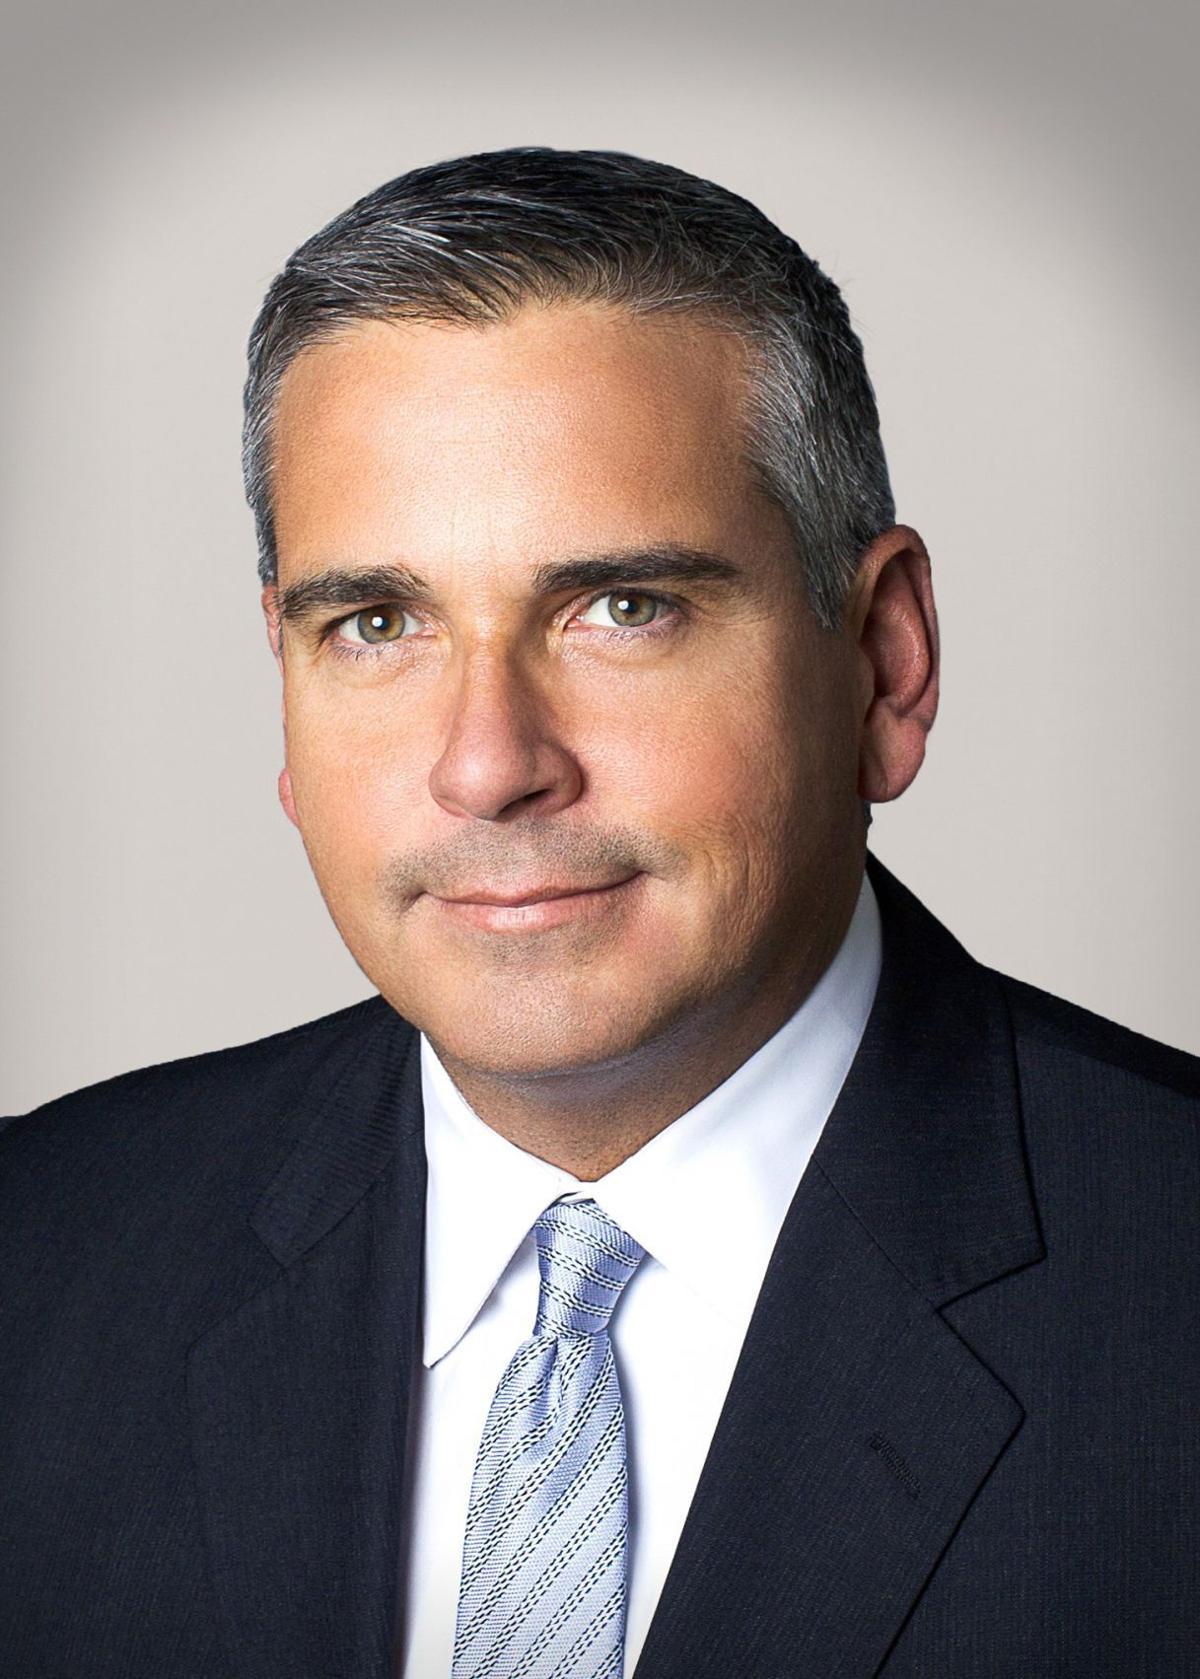 Iowa state Sen. Matt McCoy